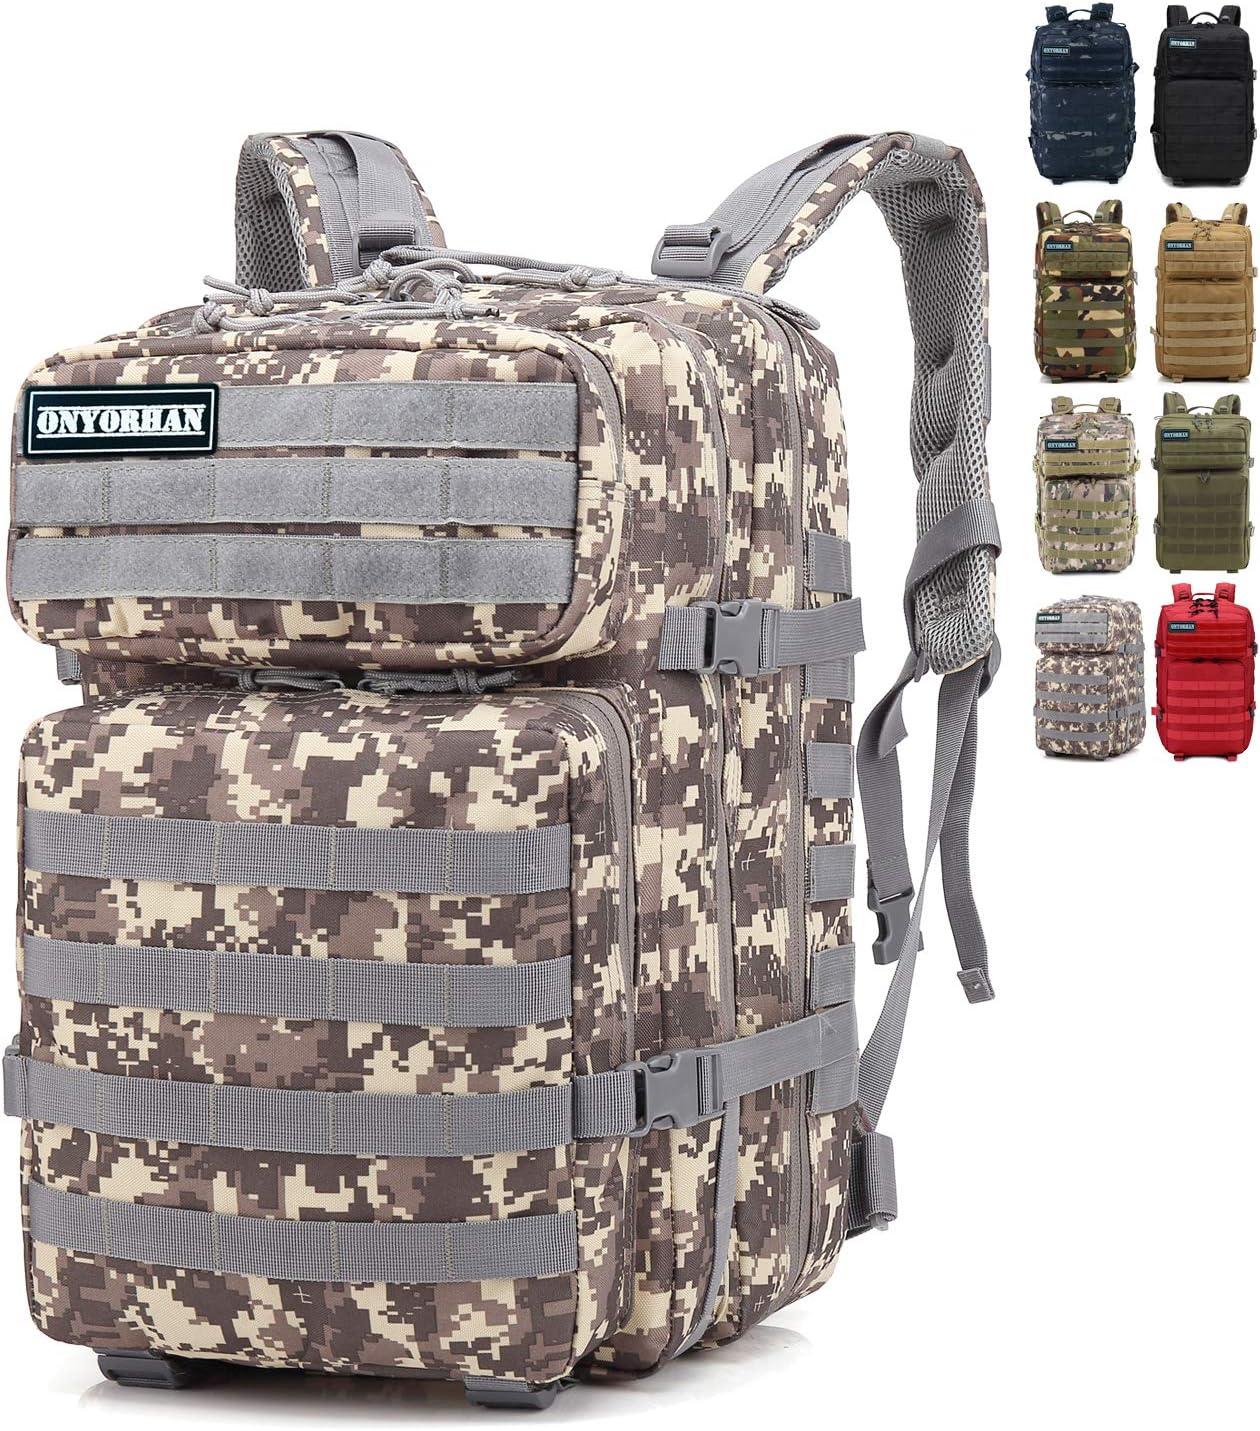 onyorhan Mochila Táctica Militar Molle Camuflaje Assault Pack Tactical Army Backpack / 40L (ACU): Amazon.es: Deportes y aire libre